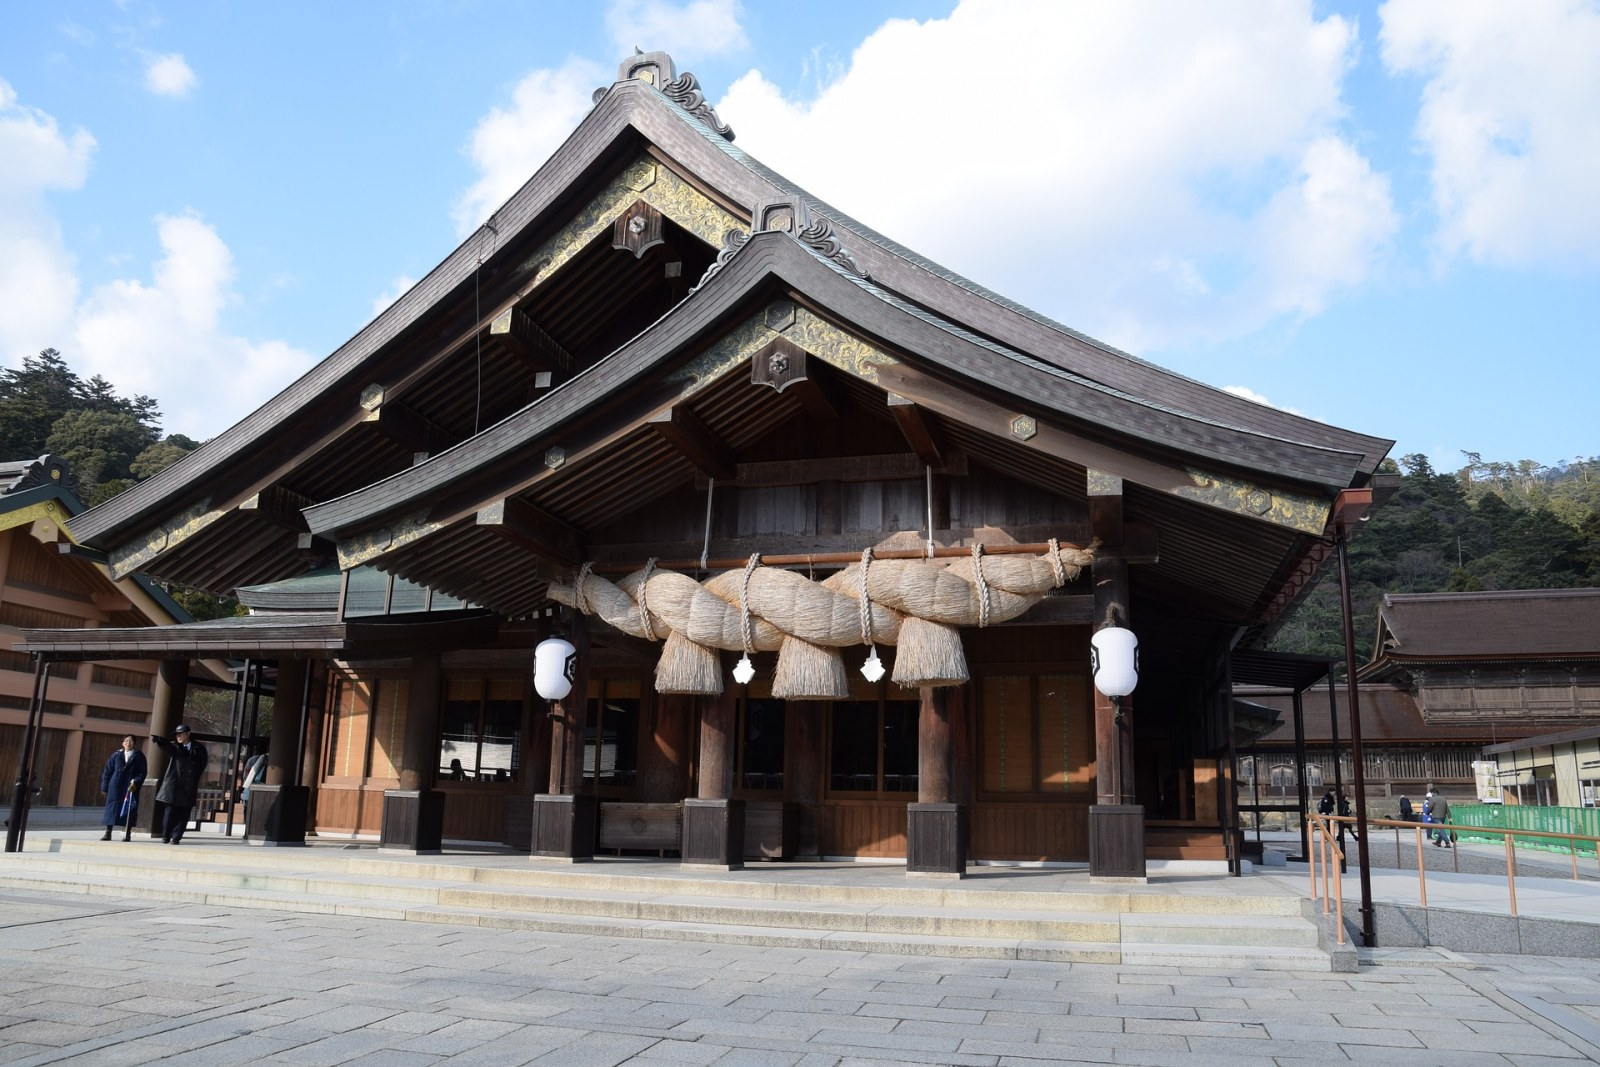 izumo-taisha, Japan, Supplier